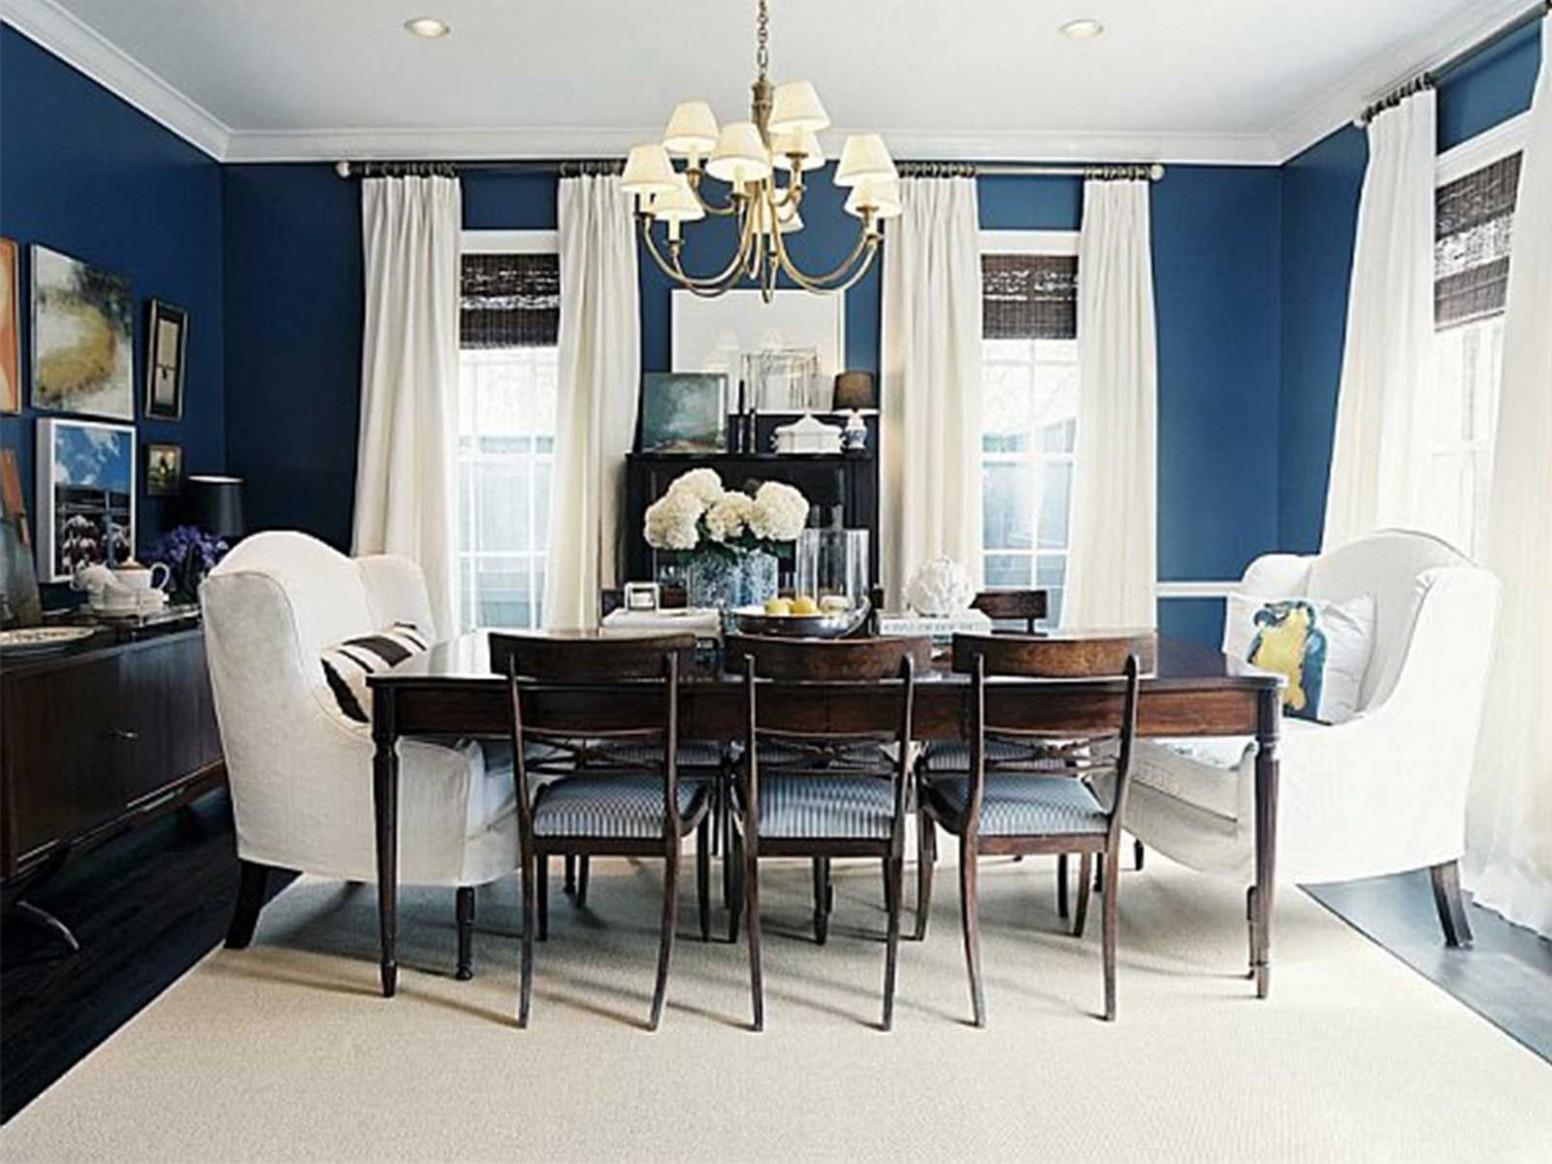 8 Romantic Style Dining Room Ideas  Dining room blue, Blue  - Dining Room Ideas Blue